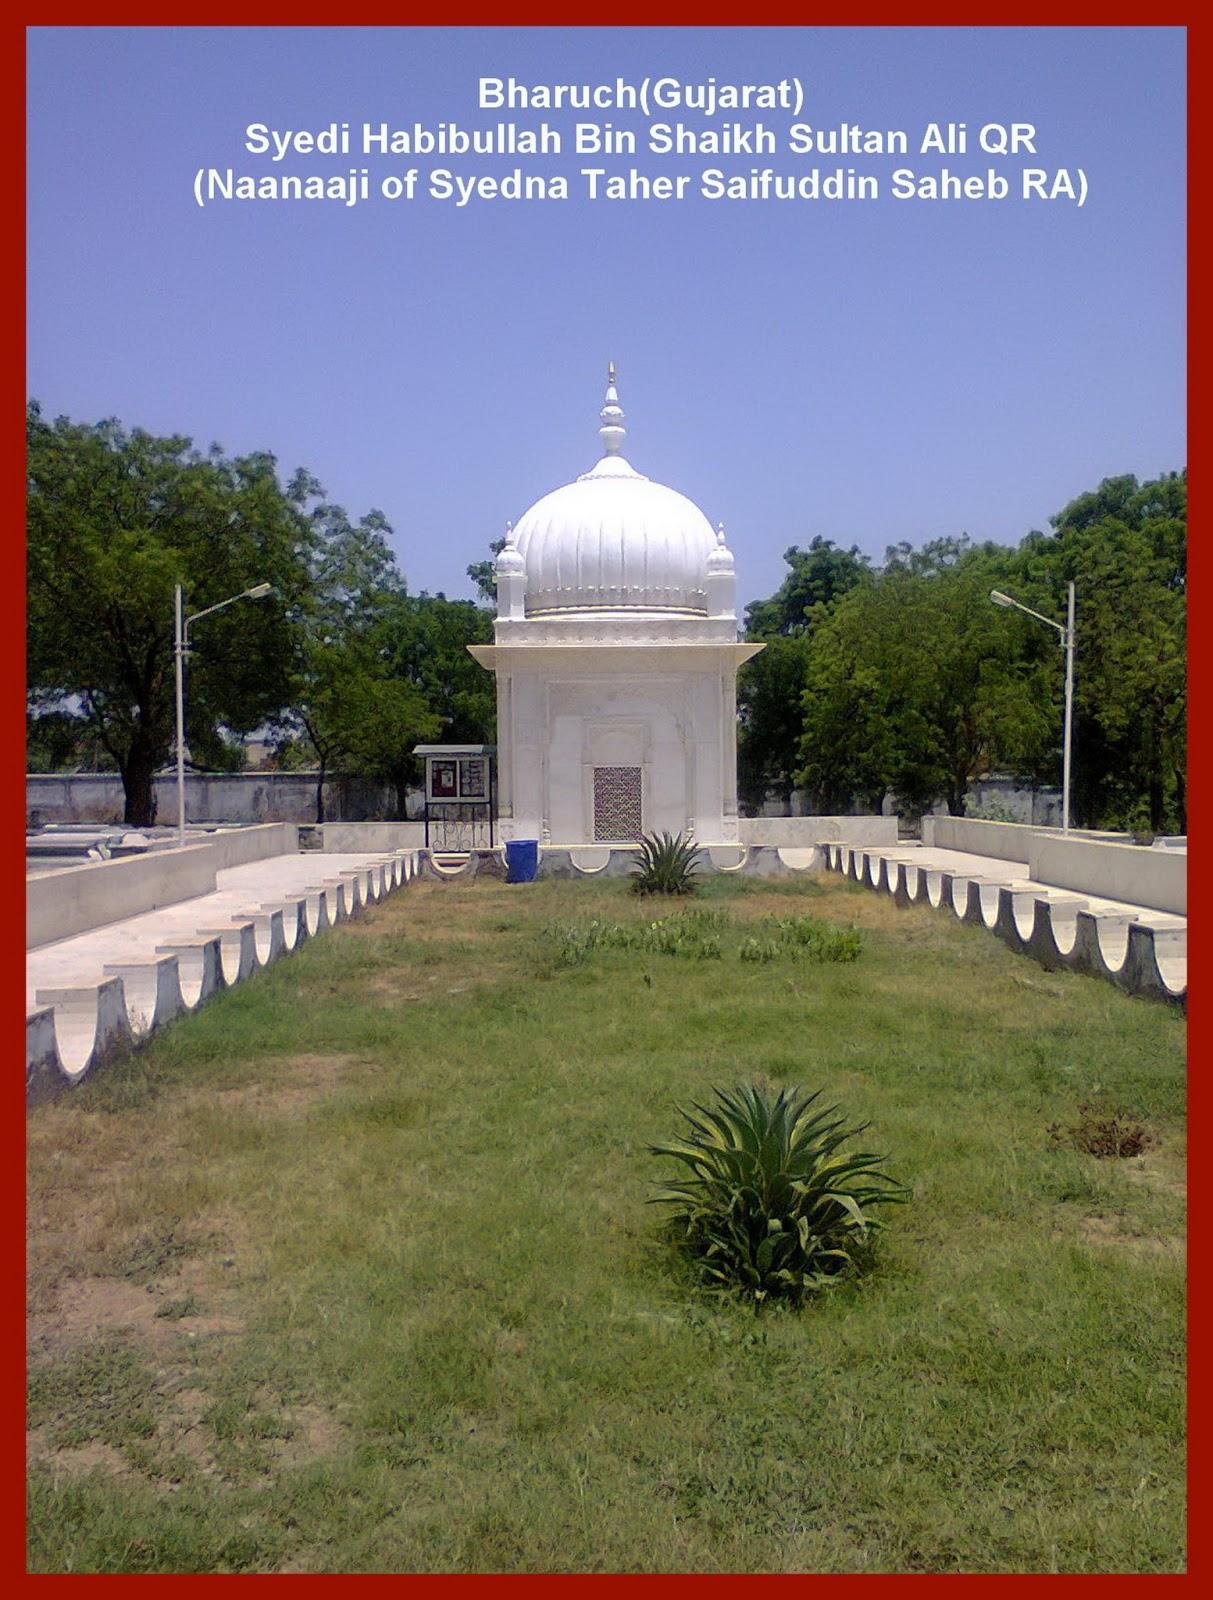 Bharuch Ziyarat-Gujarat